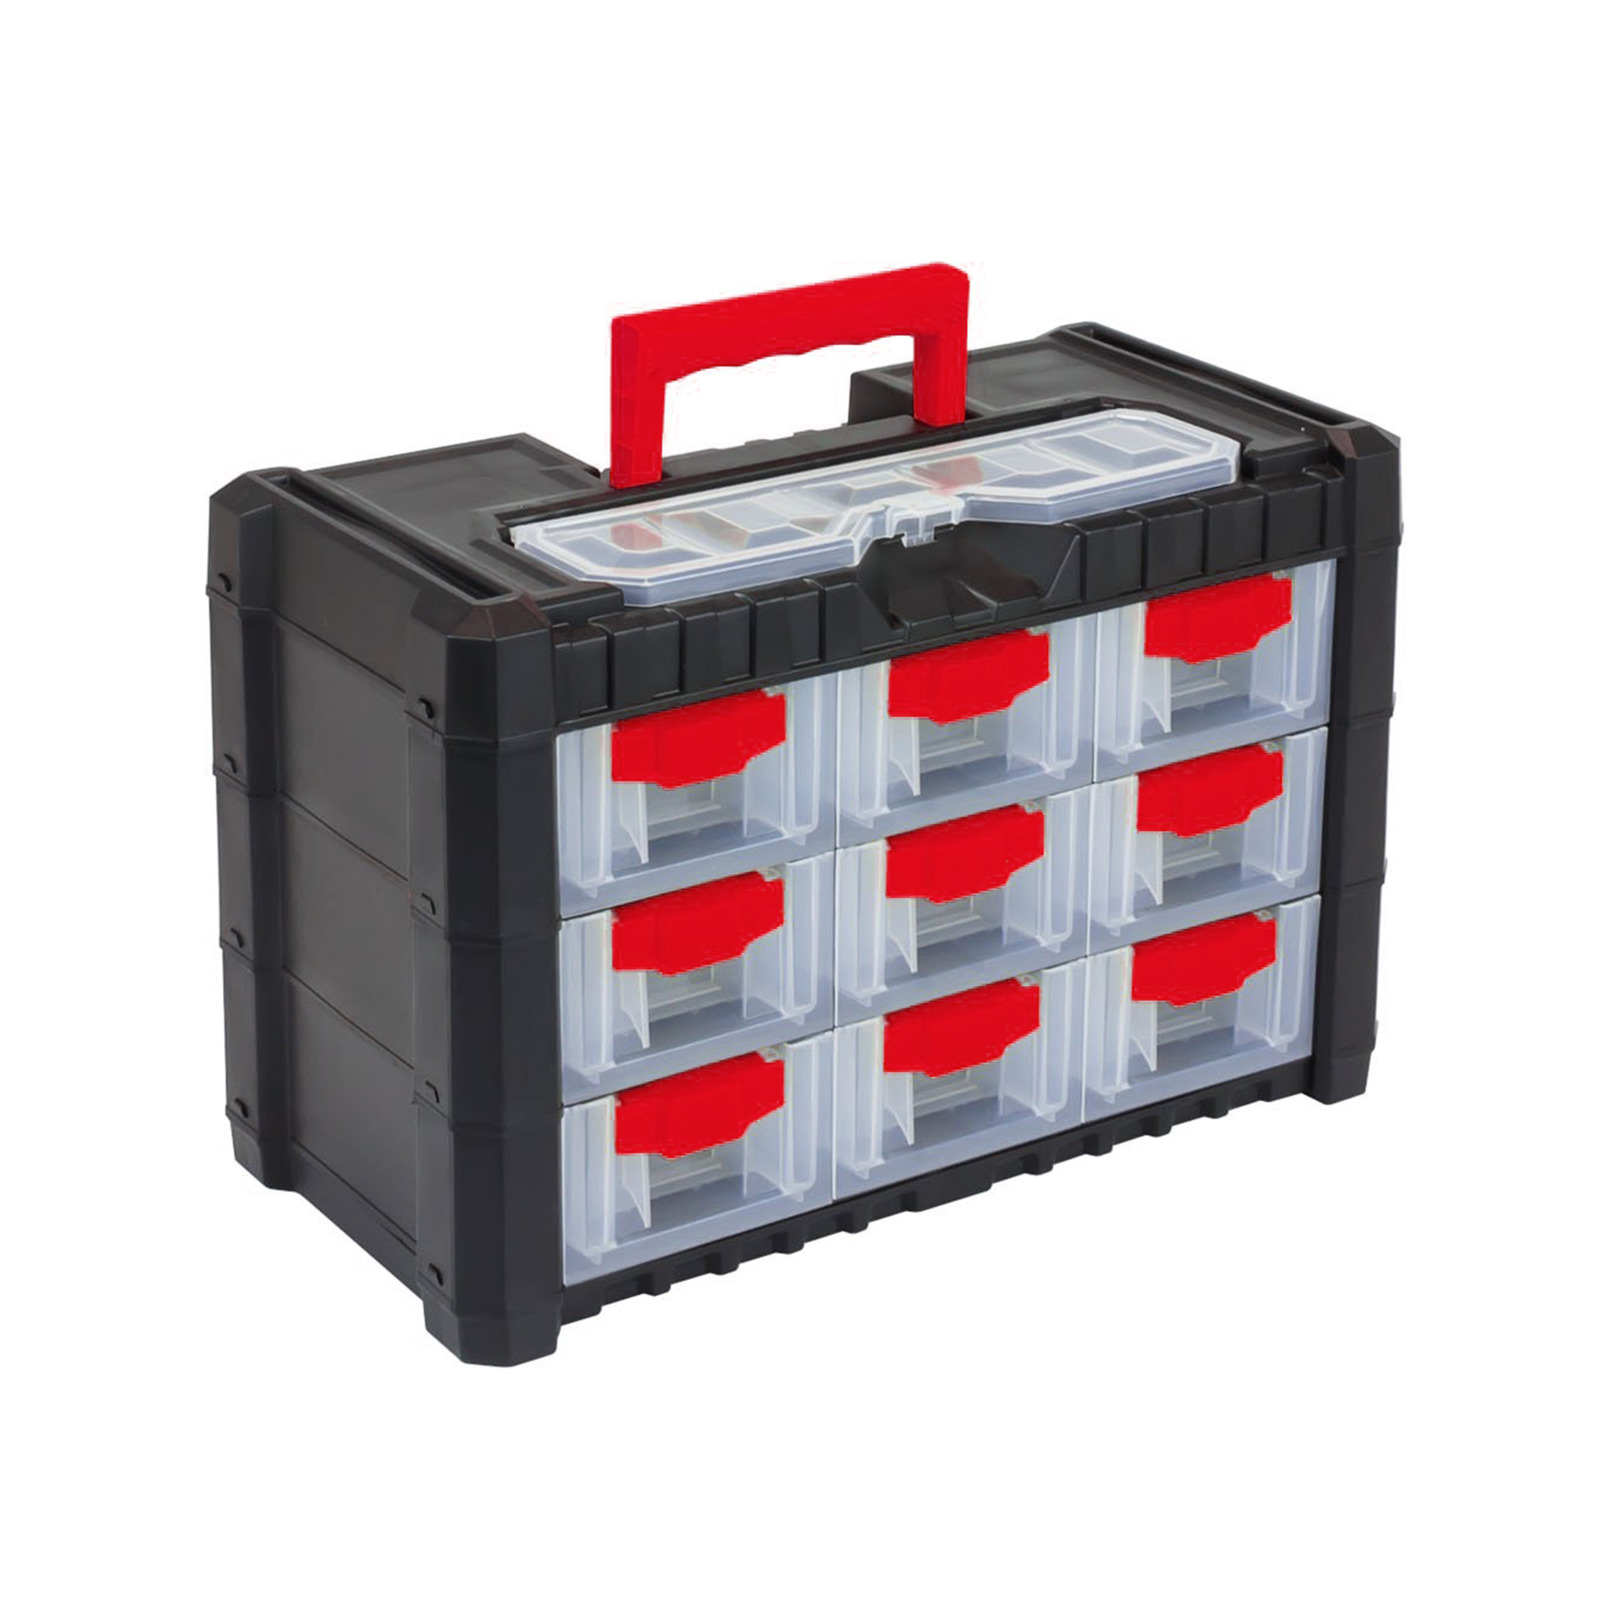 Prosperplast Multicase Cargo Tool Box 10